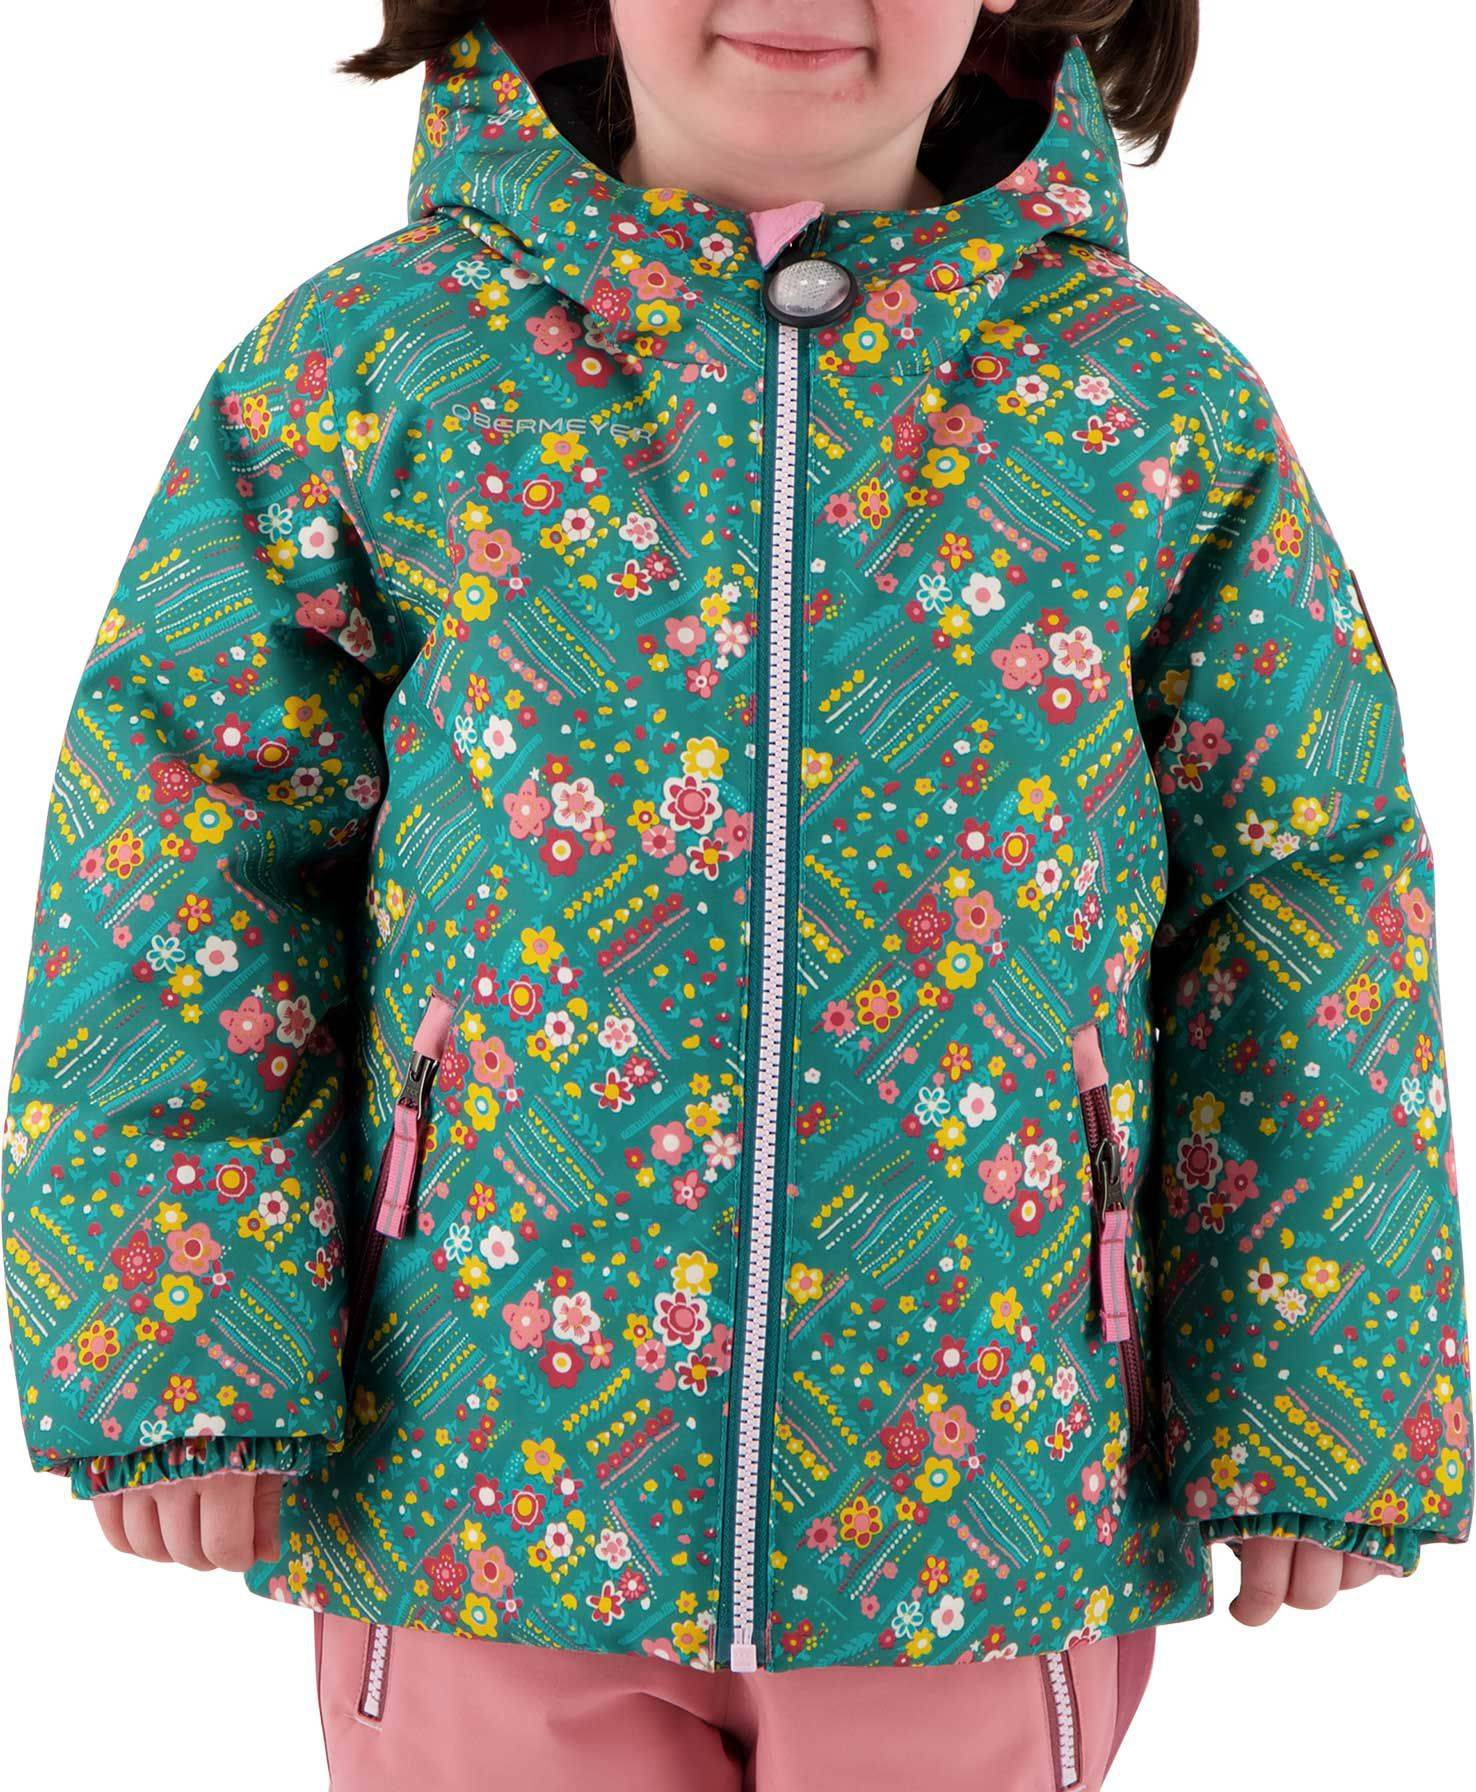 Obermeyer Youth Ash Winter Jacket, Girls', Size 6, Garden Patch